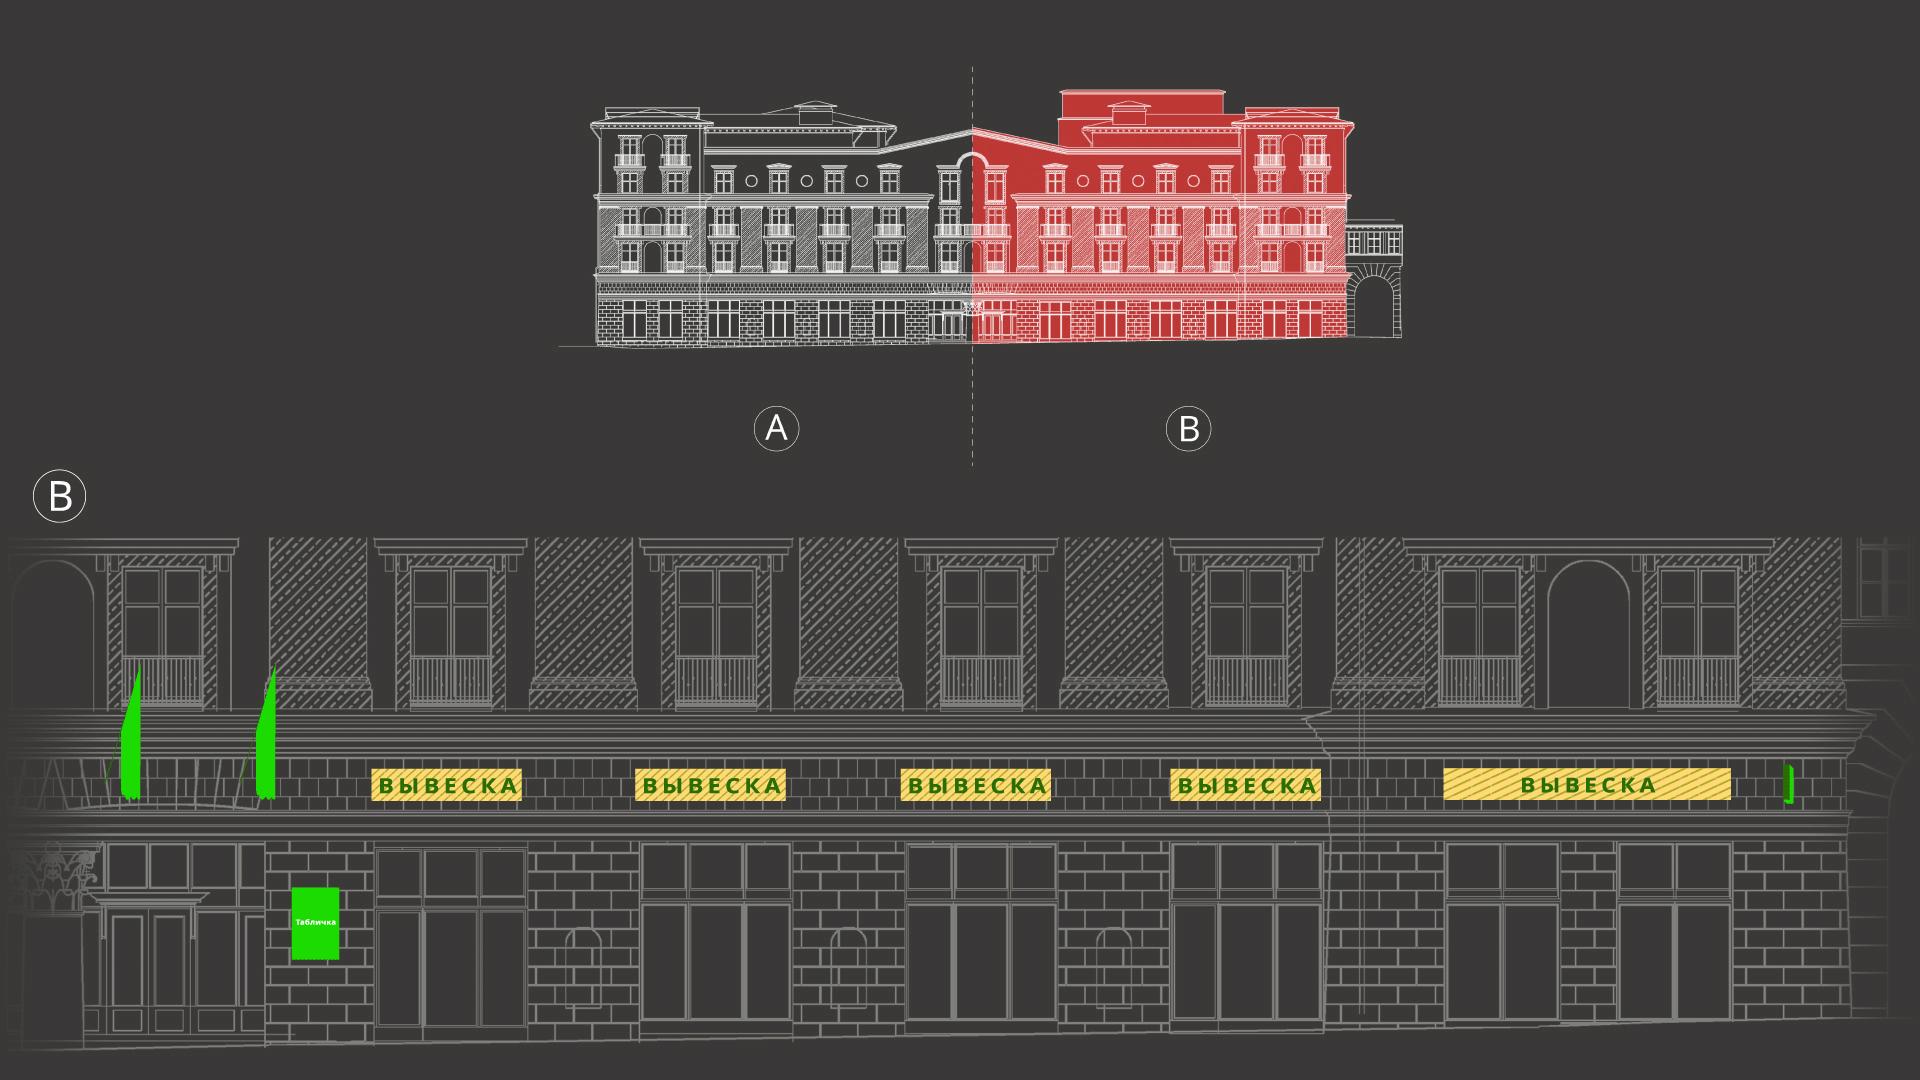 Асгард Брендинг, Красная Поляна, Курорт Красная Поляна, дизайн-код, реклама, нормативы размещения вывесок, реклама на фасаде